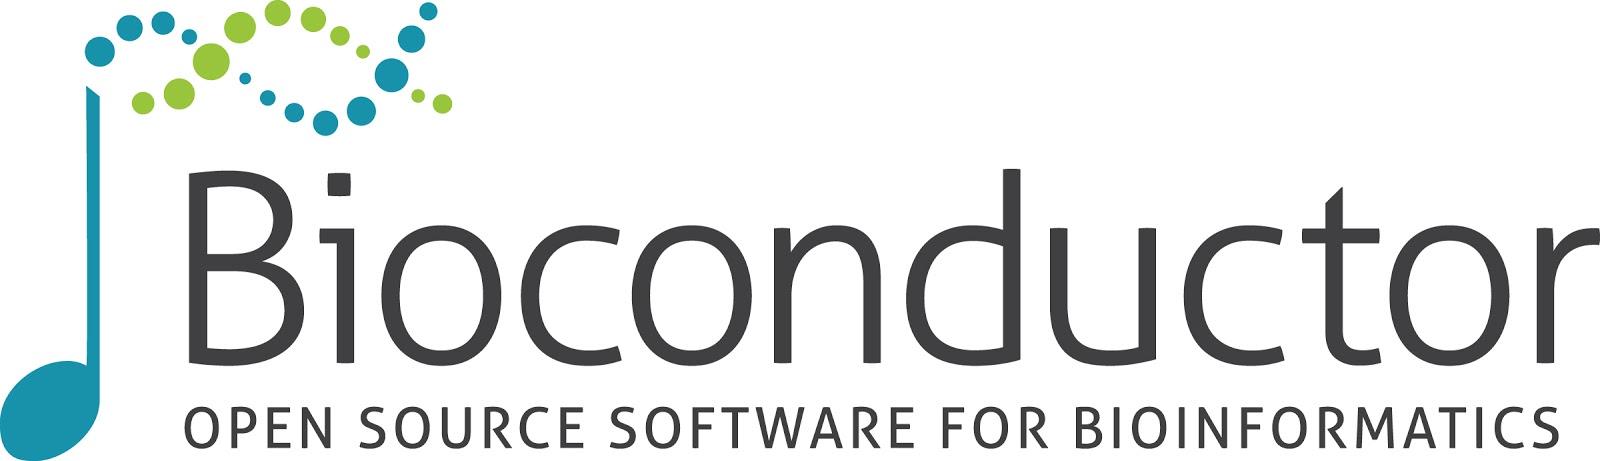 Google Open Source Blog: July 2013